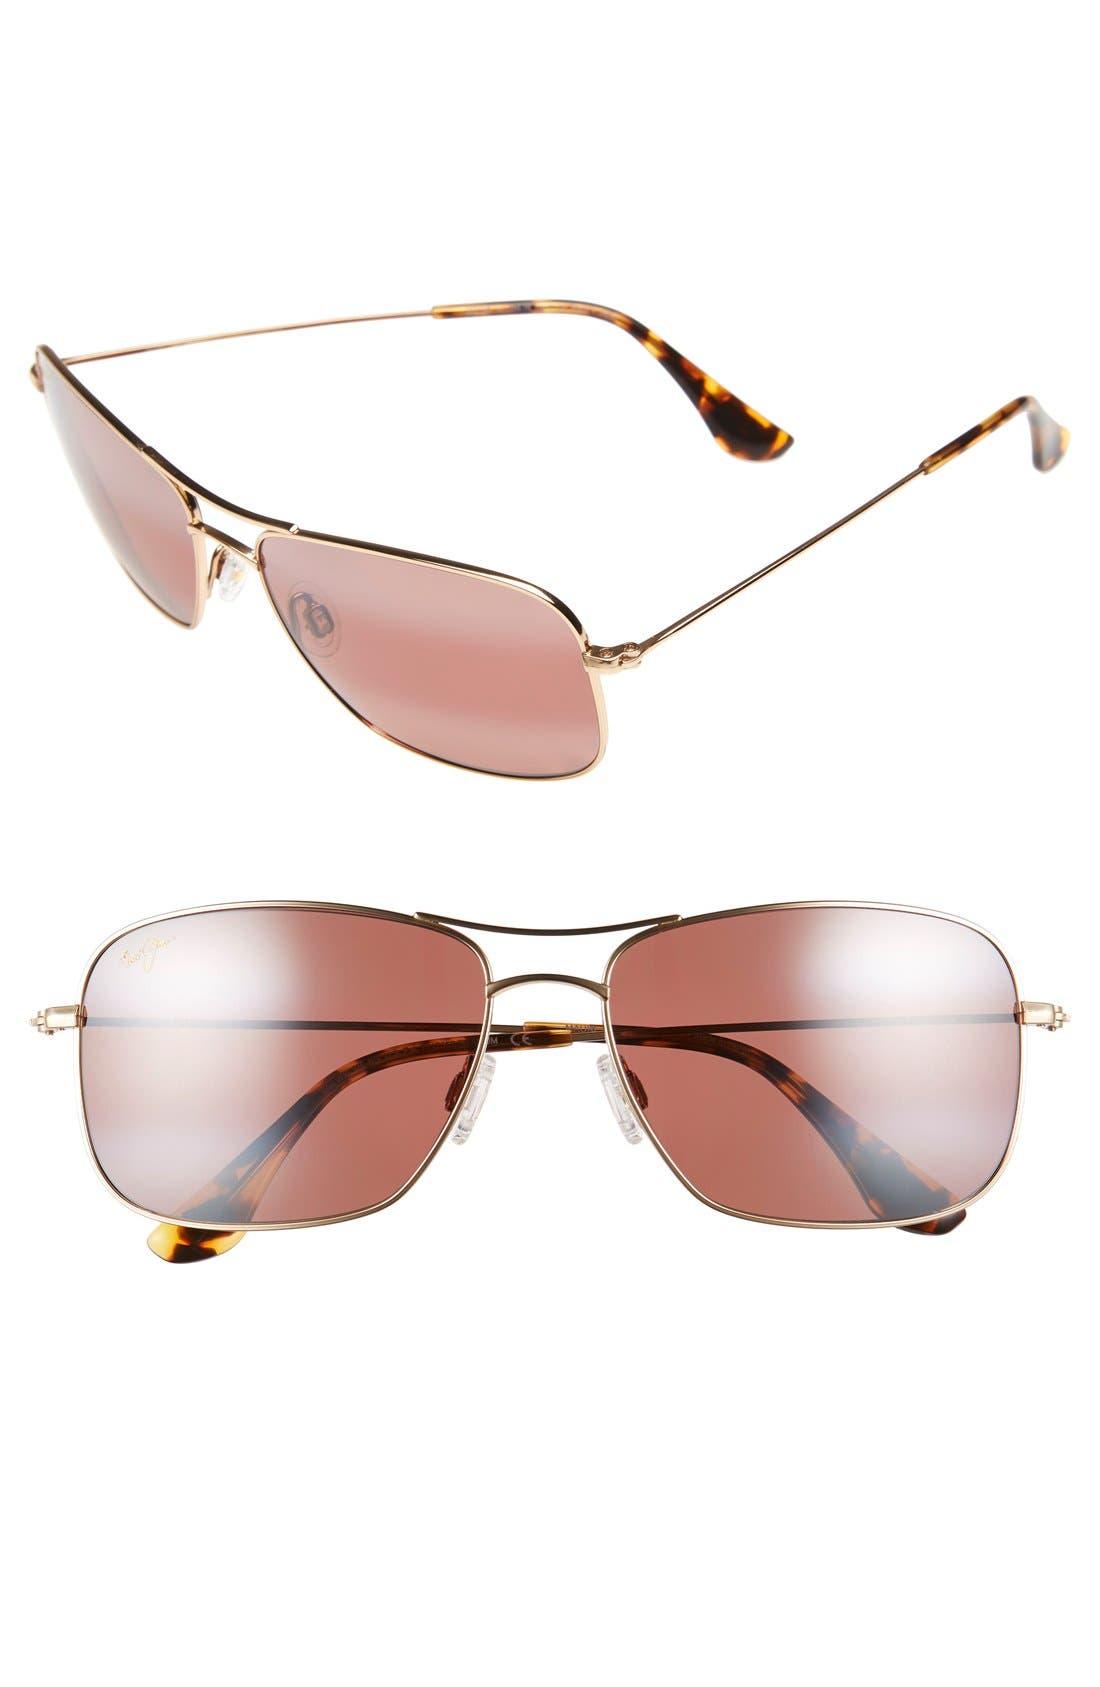 Wiki Wiki 59mm PolarizedPlus2<sup>®</sup> Sunglasses,                             Main thumbnail 1, color,                             GOLD/ MAUI ROSE